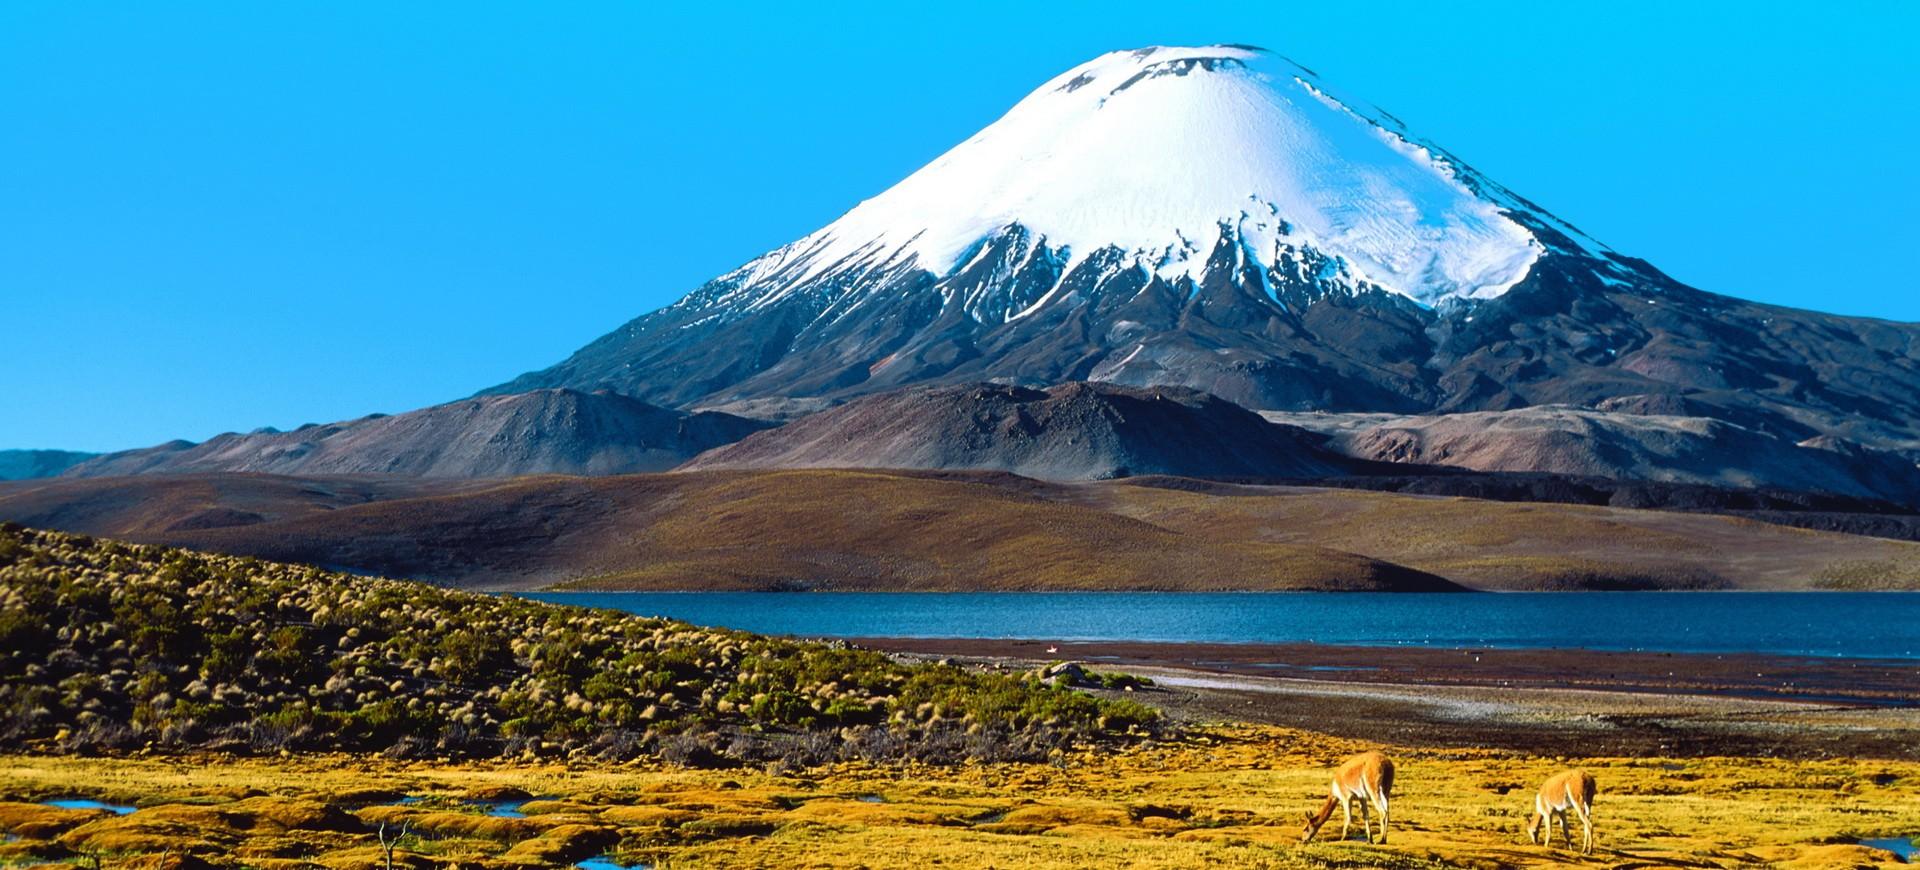 Chili Villarrica Volcan